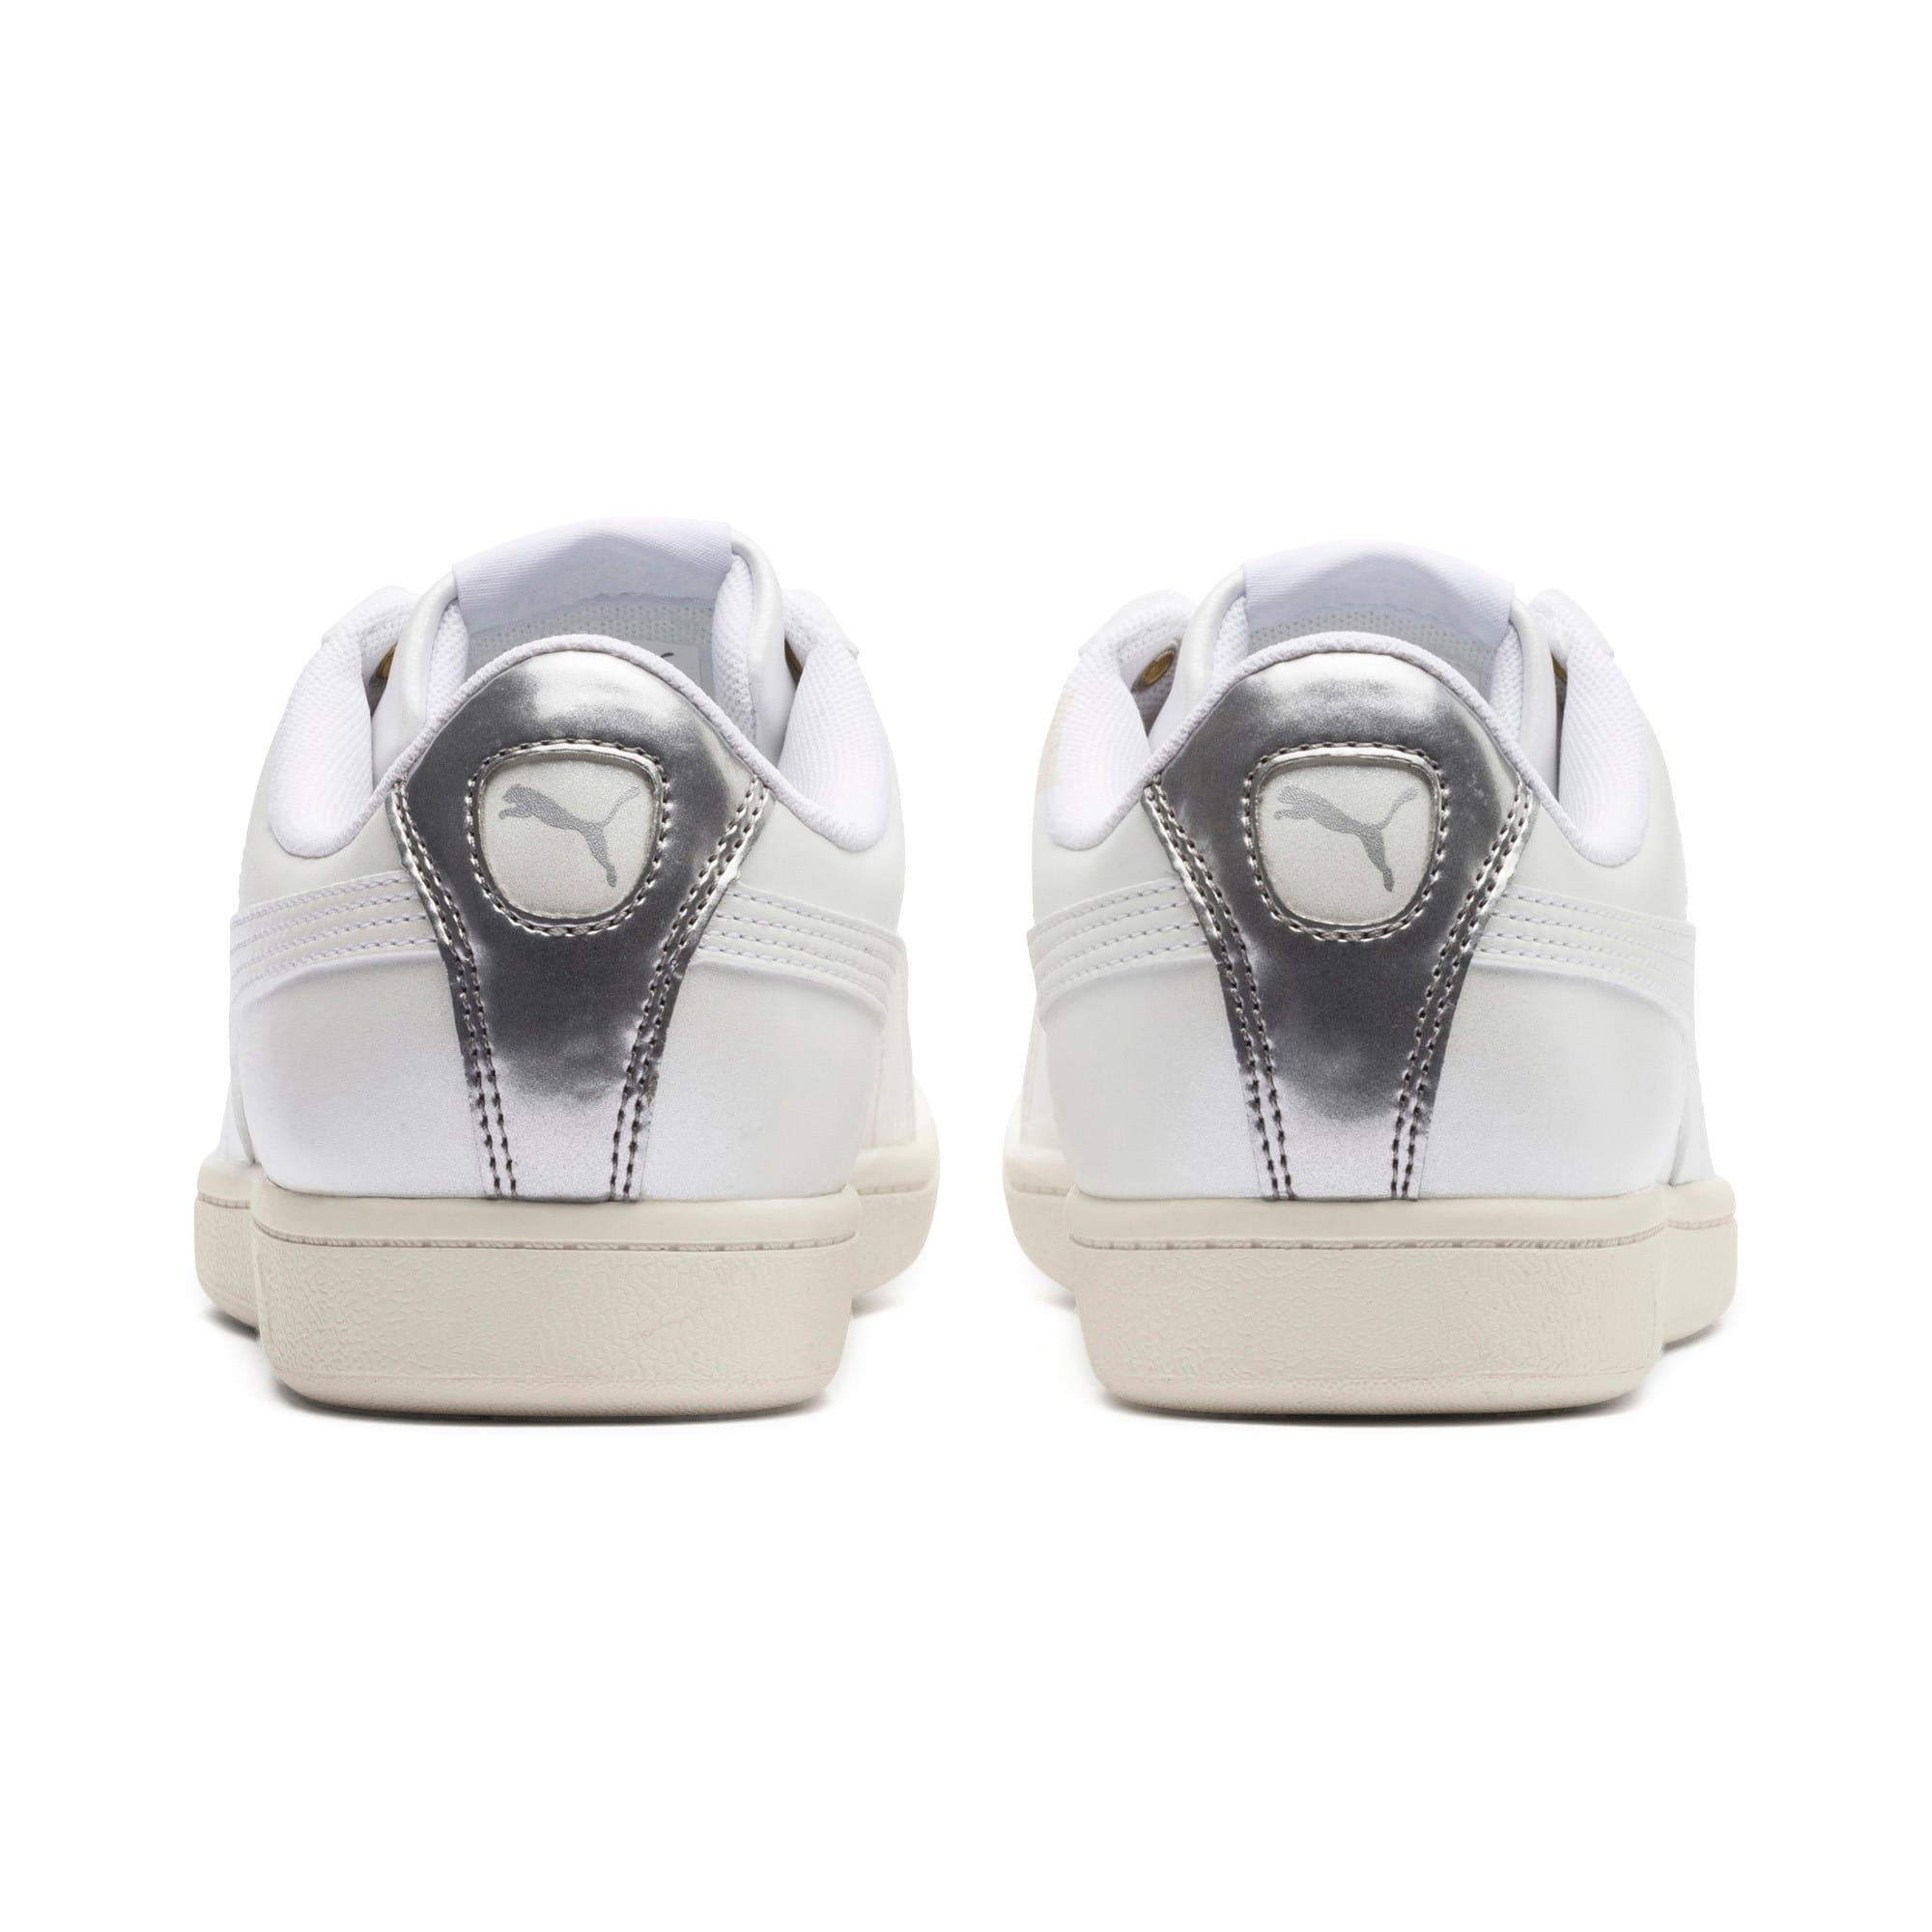 Thumbnail 4 of Puma Vikky LX Sneakers, Puma White-White-Whisper, medium